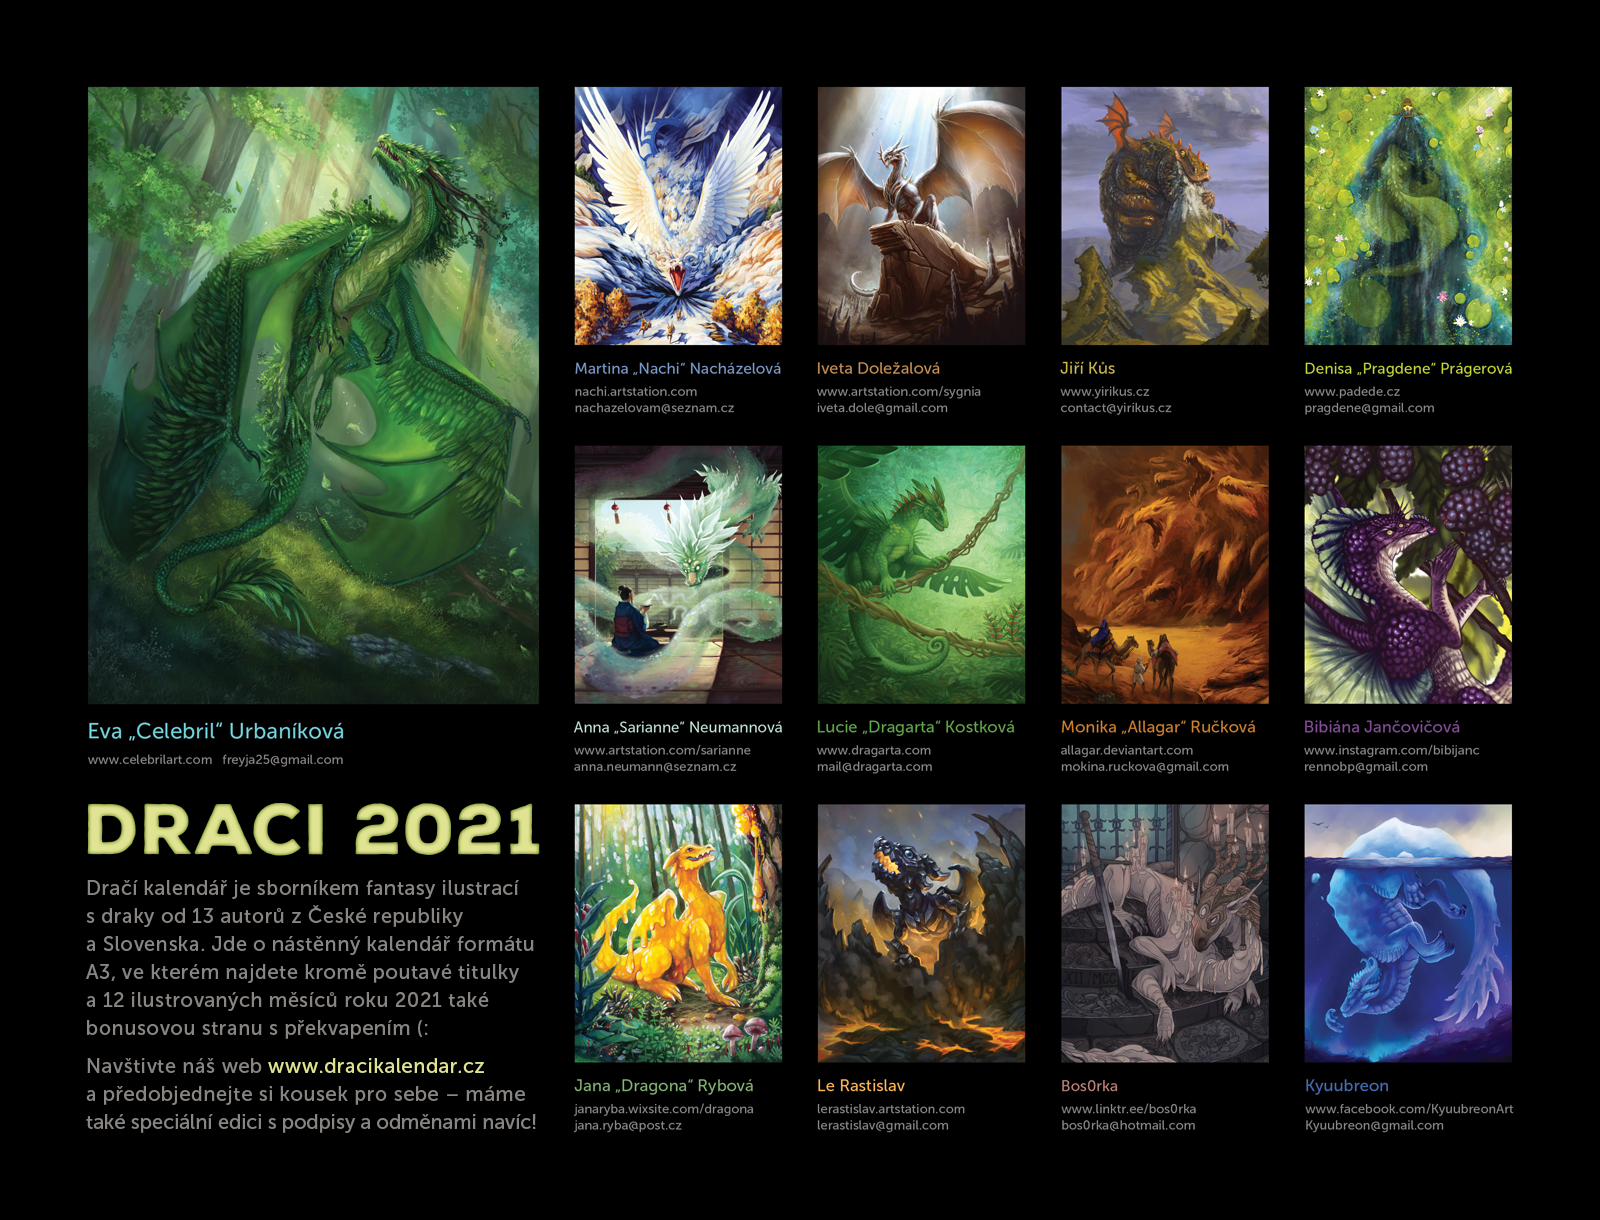 https://obchod.dragarta.com/draci-kalendar/draci-2021-special/